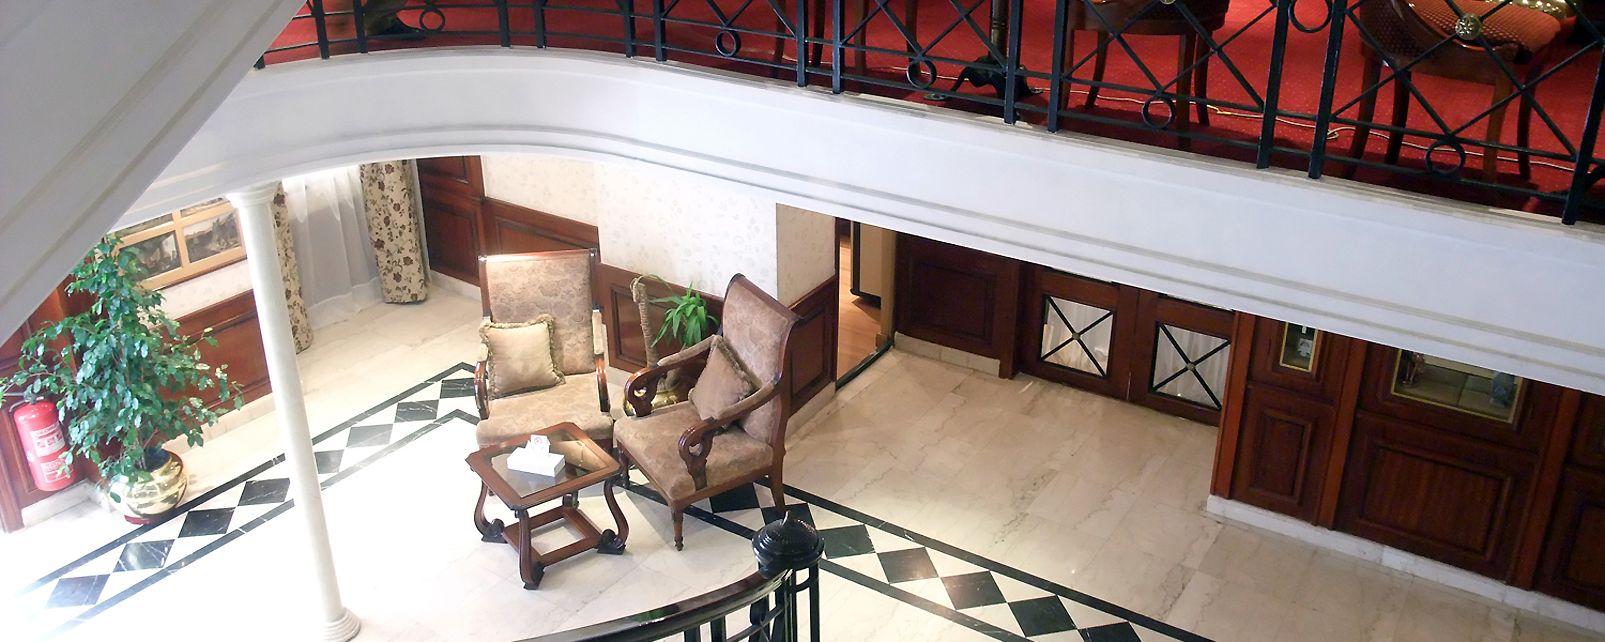 Hotel Bateau MS Champollion